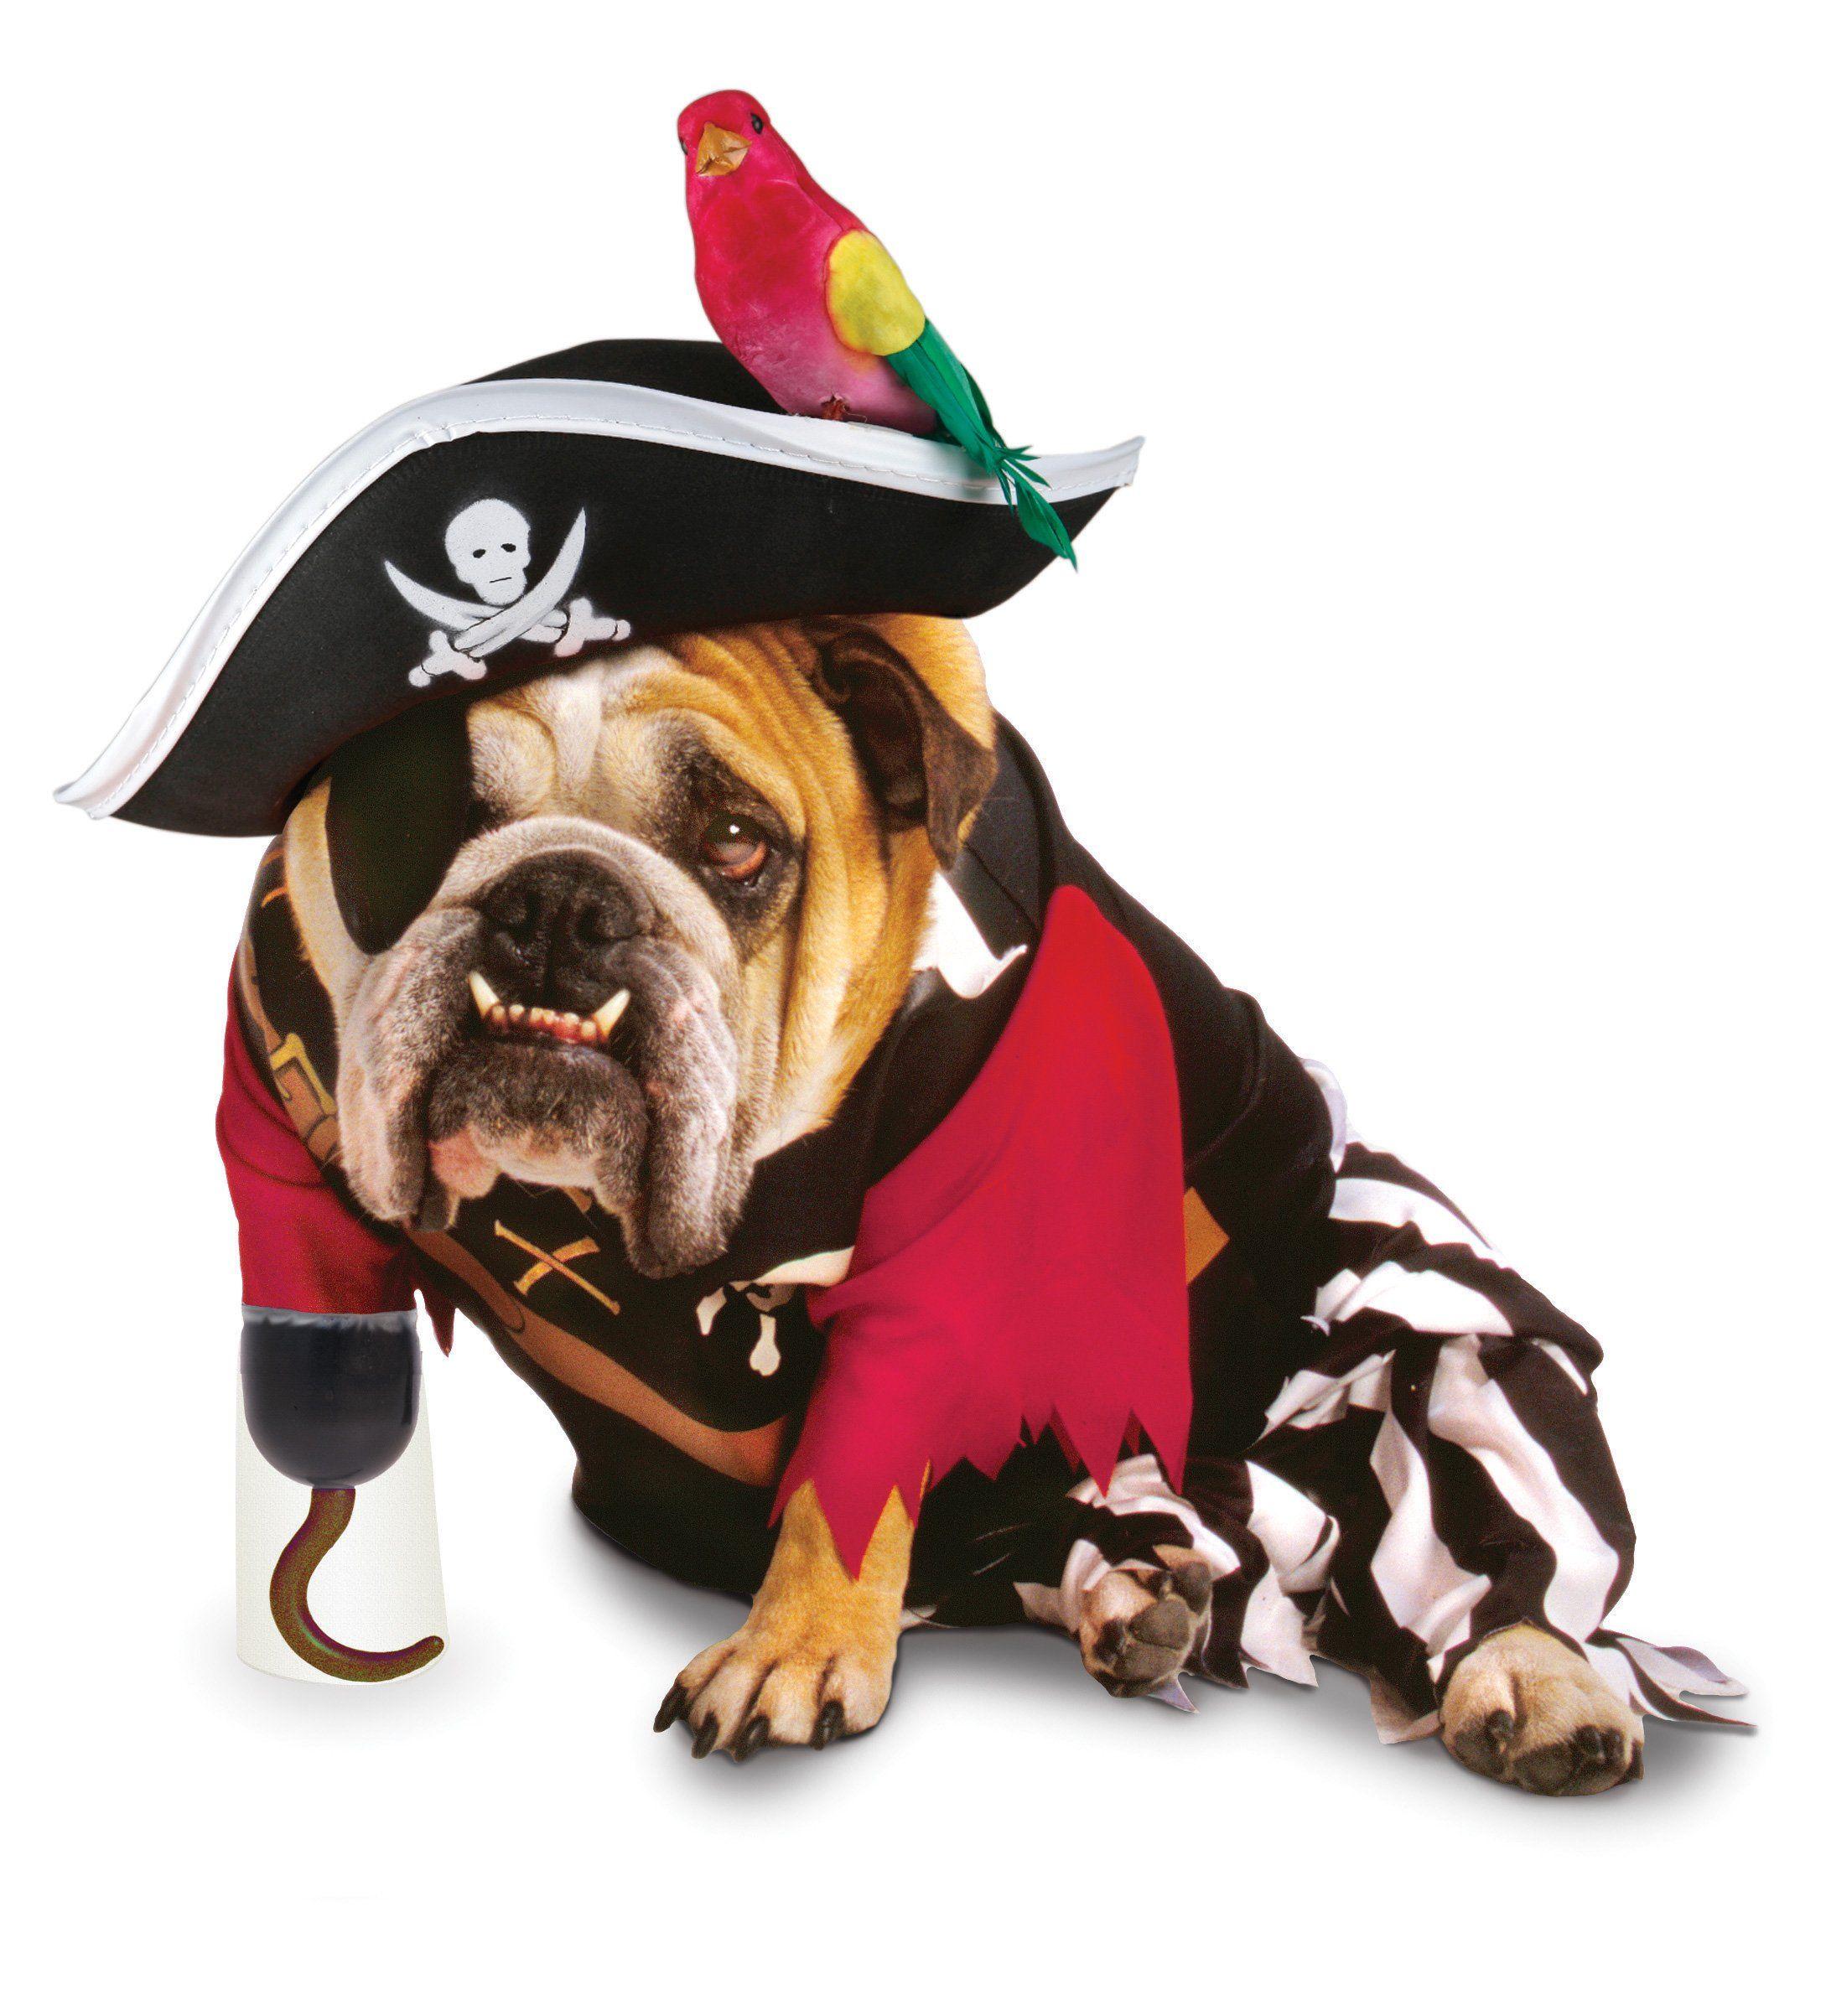 Costume Halloween cane pirata